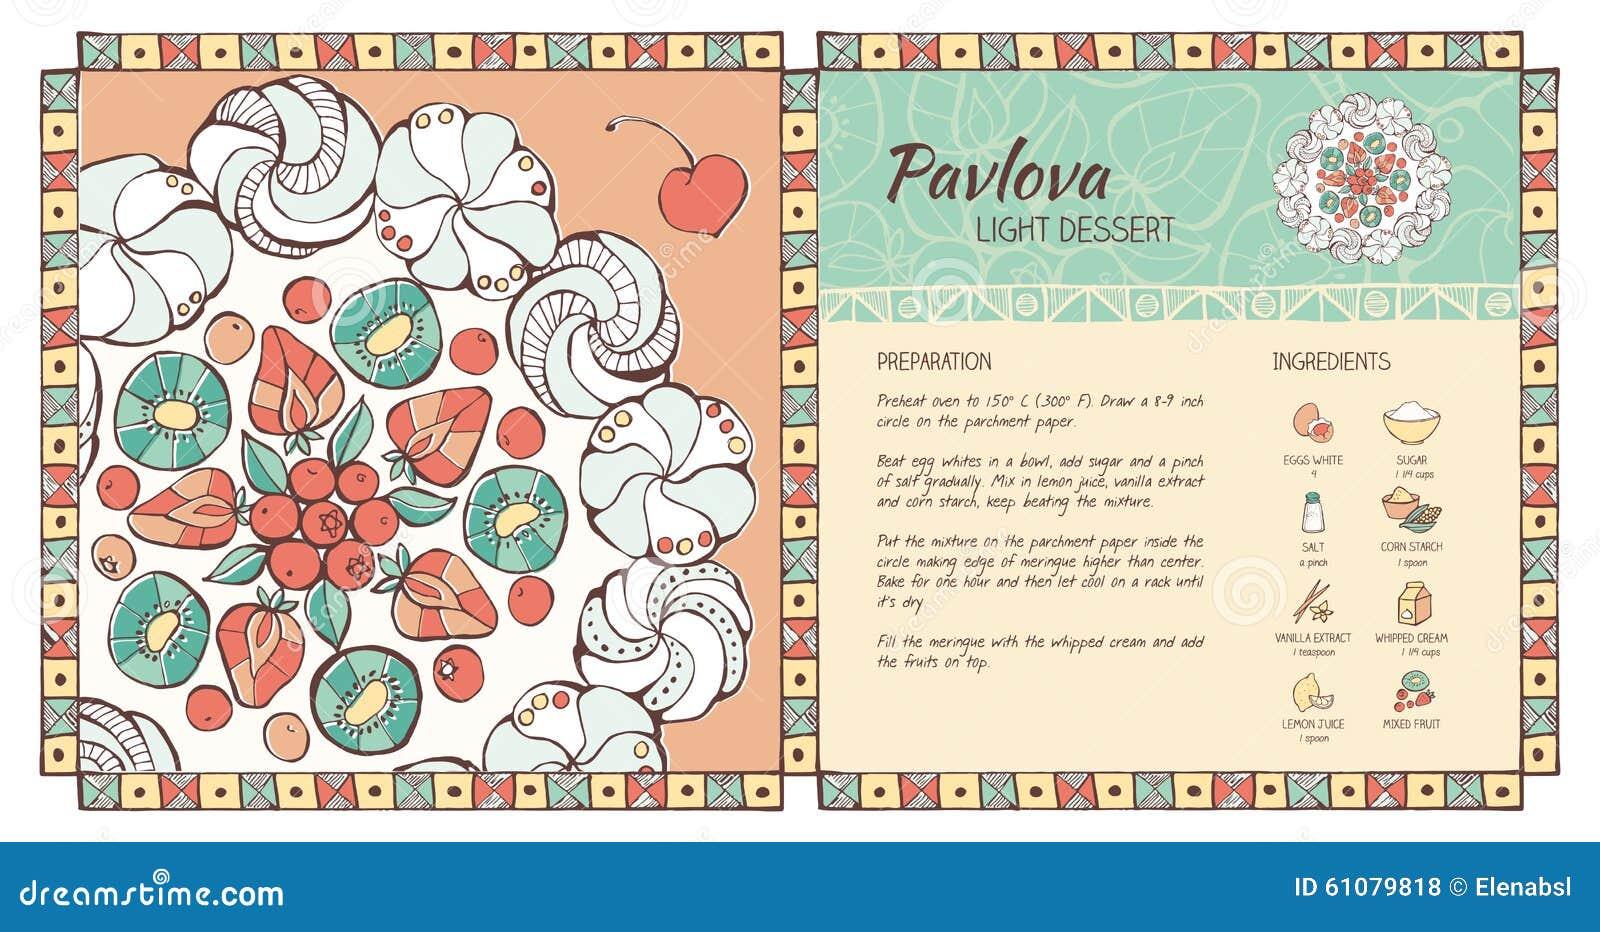 pavlova dessert stock vector illustration of kiwi dessert 61079818